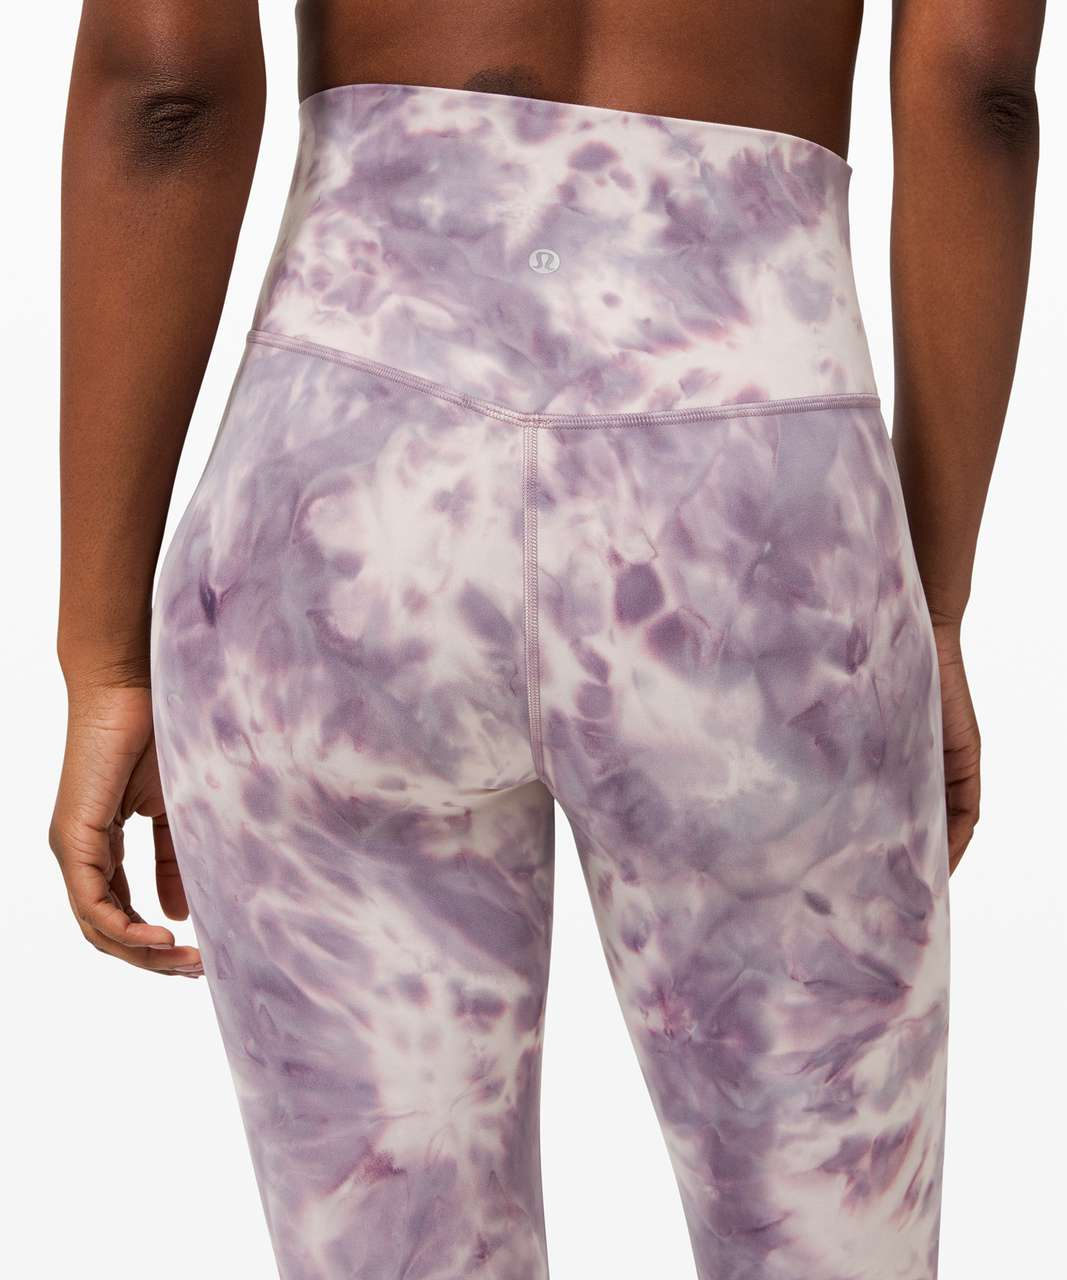 "Lululemon Align Pant 25"" *Diamond Dye - Diamond Dye Pink Bliss Graphite Purple"